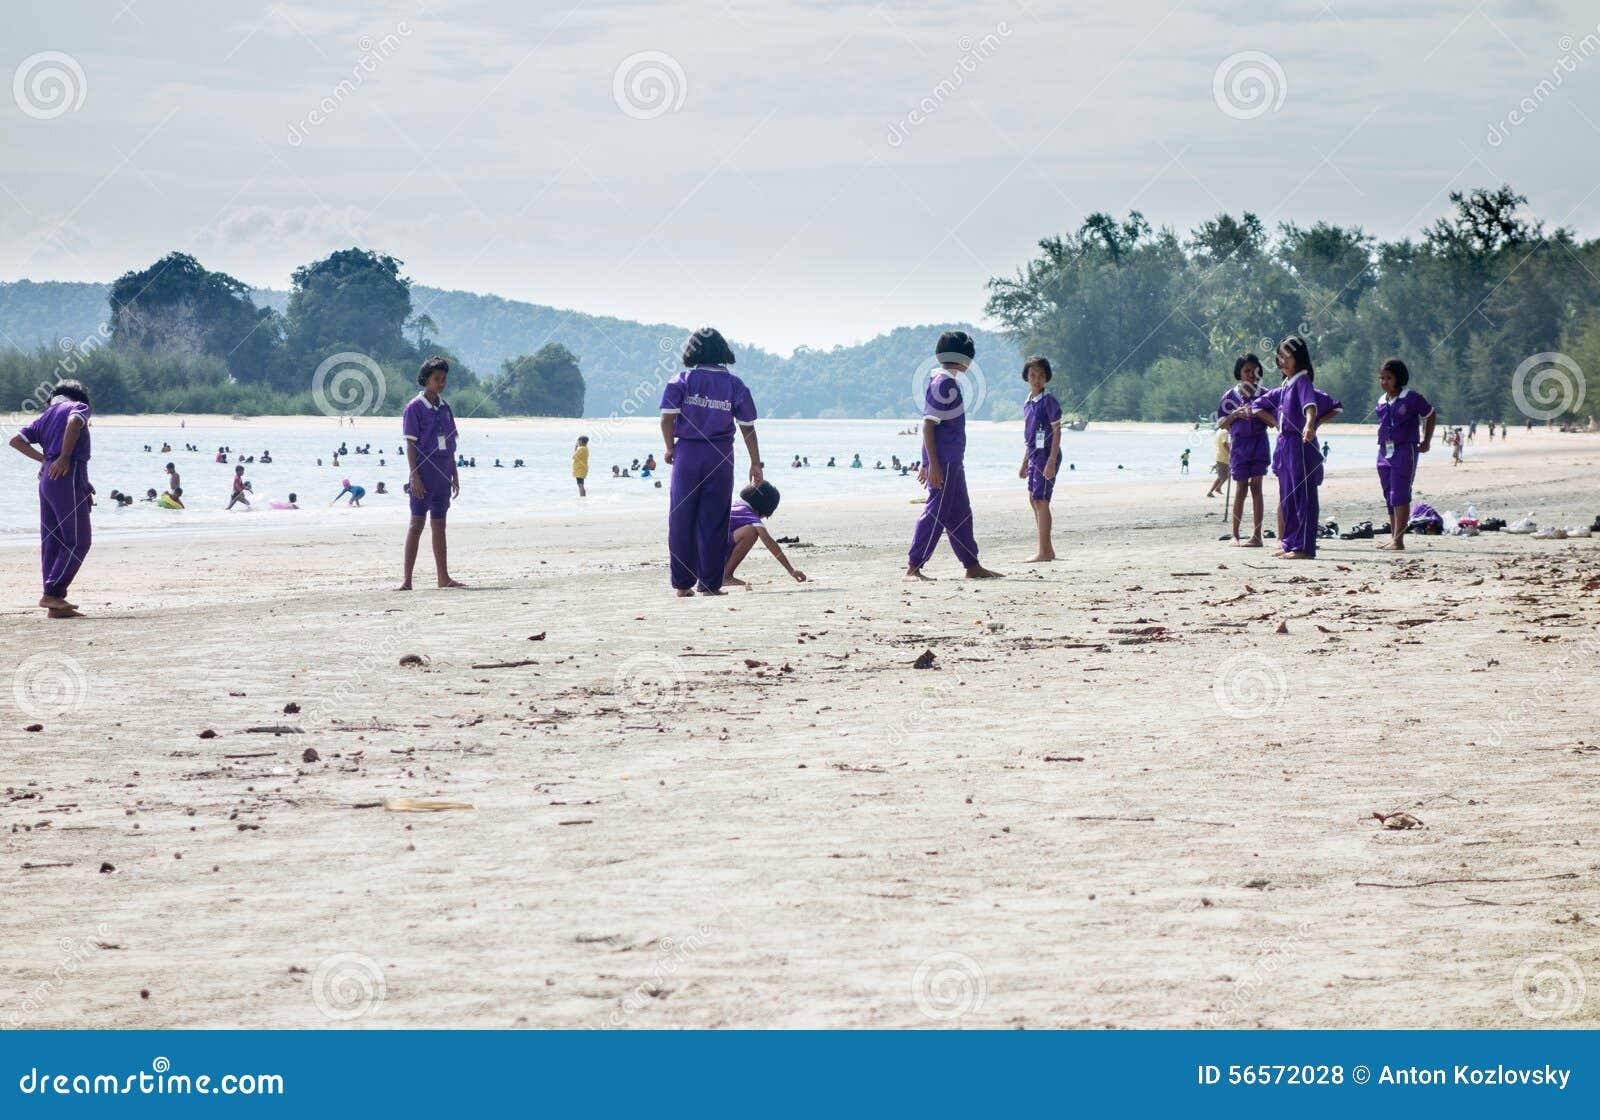 Download Ταϊλανδικά Schoolkids που παίζουν στην παραλία Εκδοτική Στοκ Εικόνες - εικόνα από schoolkid, εκμάθηση: 56572028